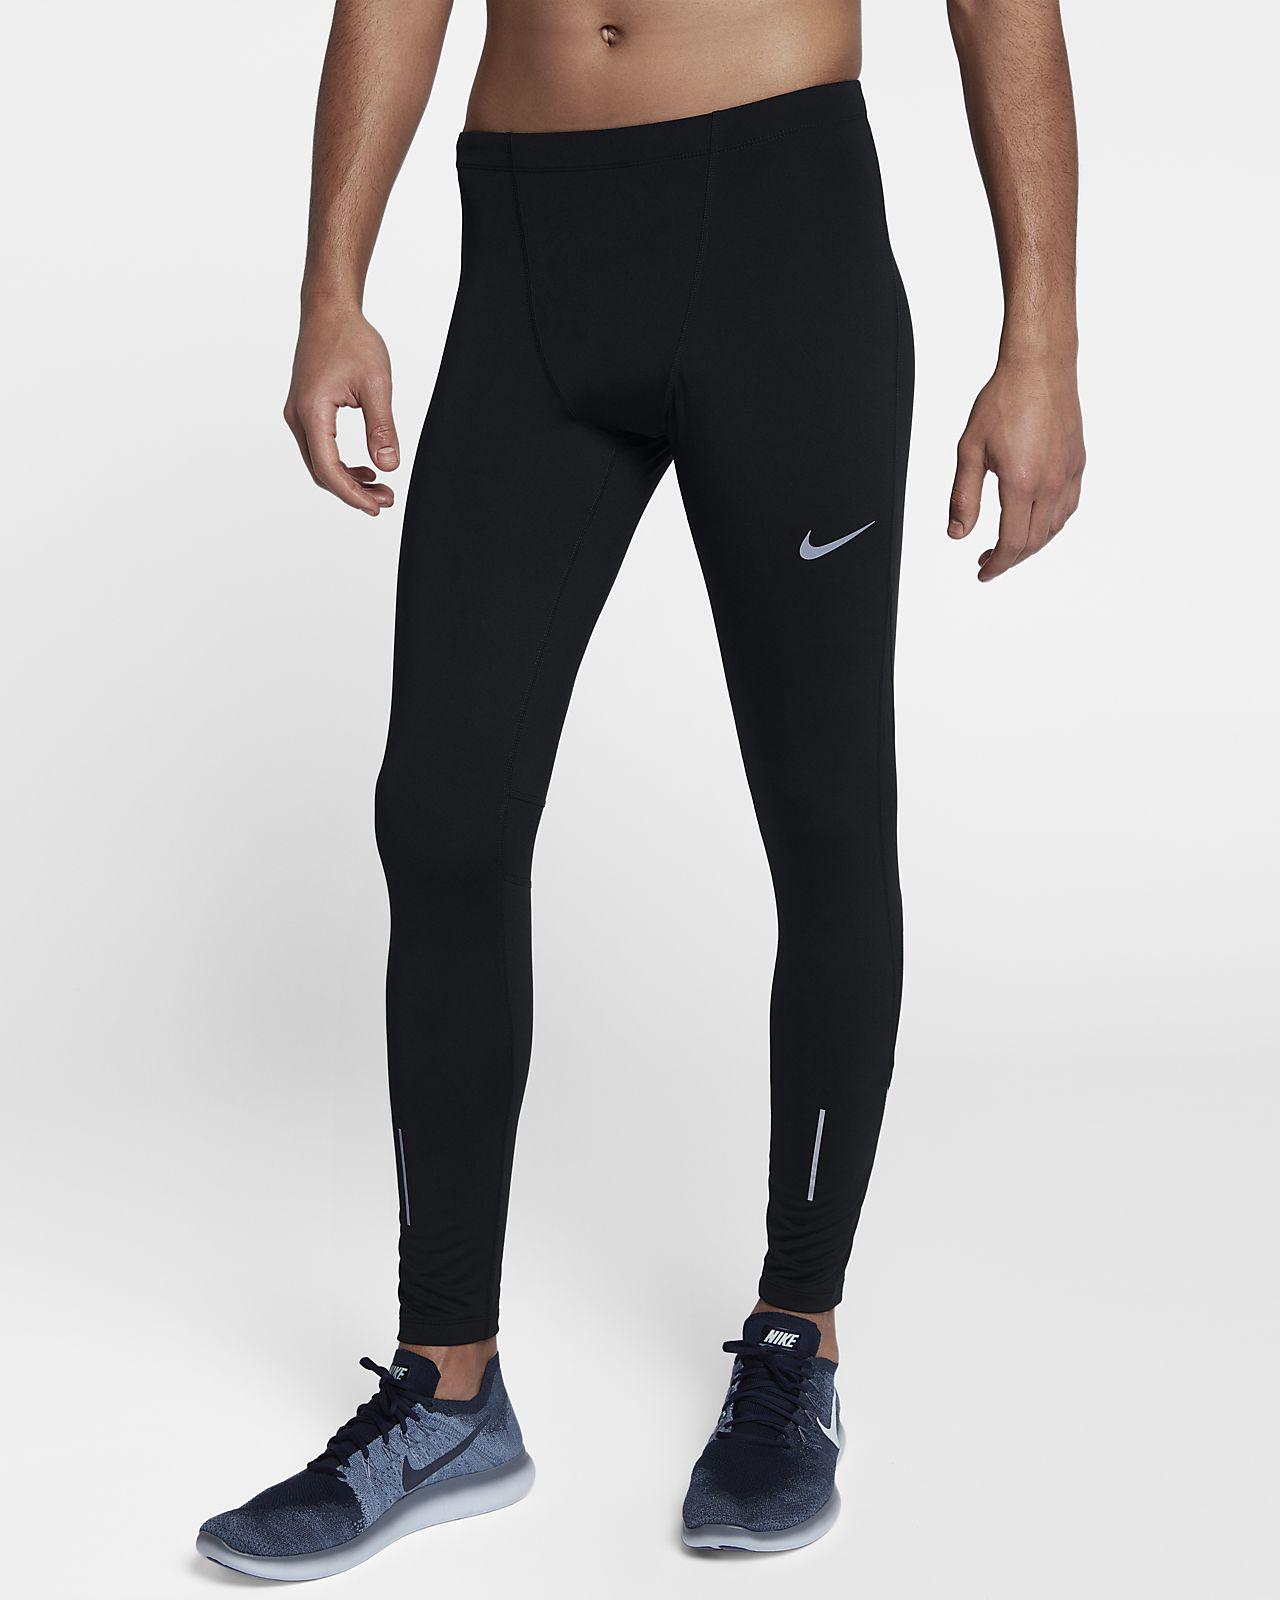 Nike Therma Run Herren-Lauf-Tights (ca. 72,5 cm)